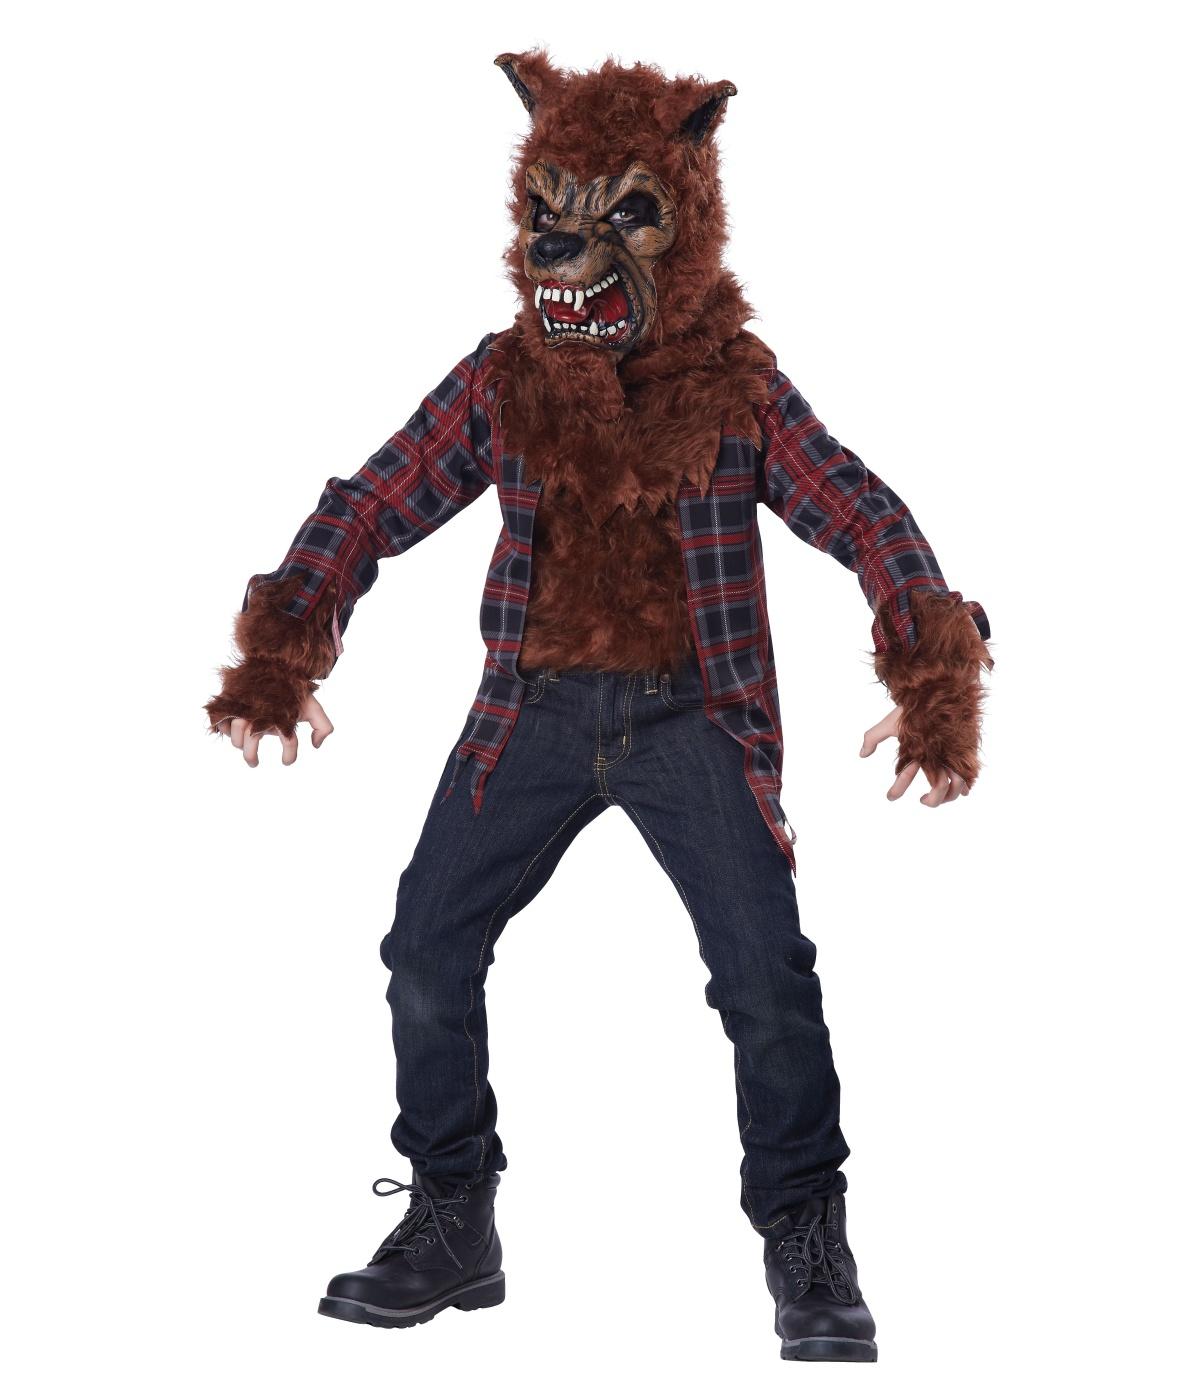 Werewolf Toys For Boys : Blood moon boys werewolf costume